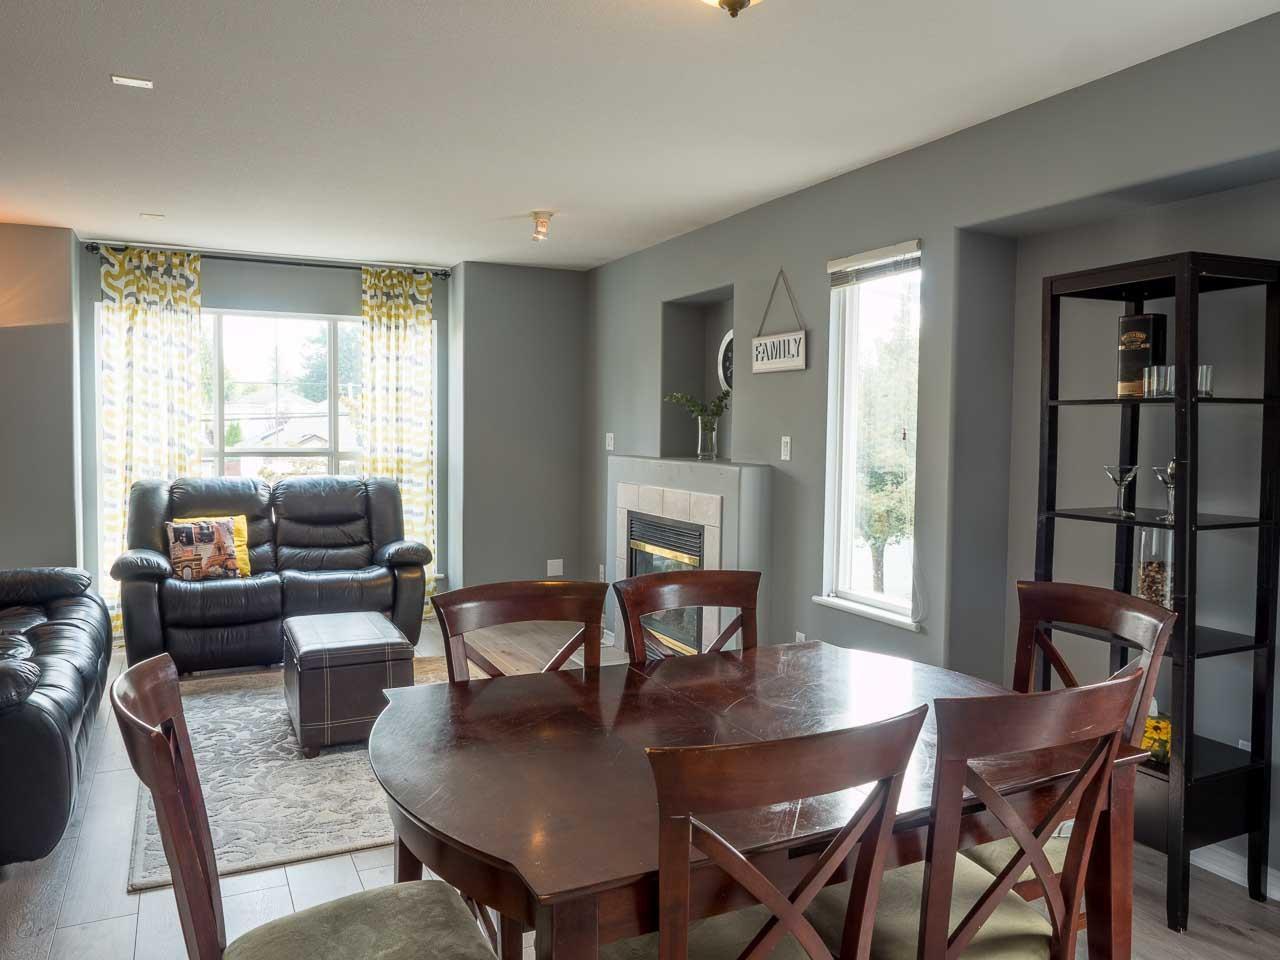 Main Photo: 11485 207 Street in Maple Ridge: Southwest Maple Ridge House for sale : MLS®# R2414171